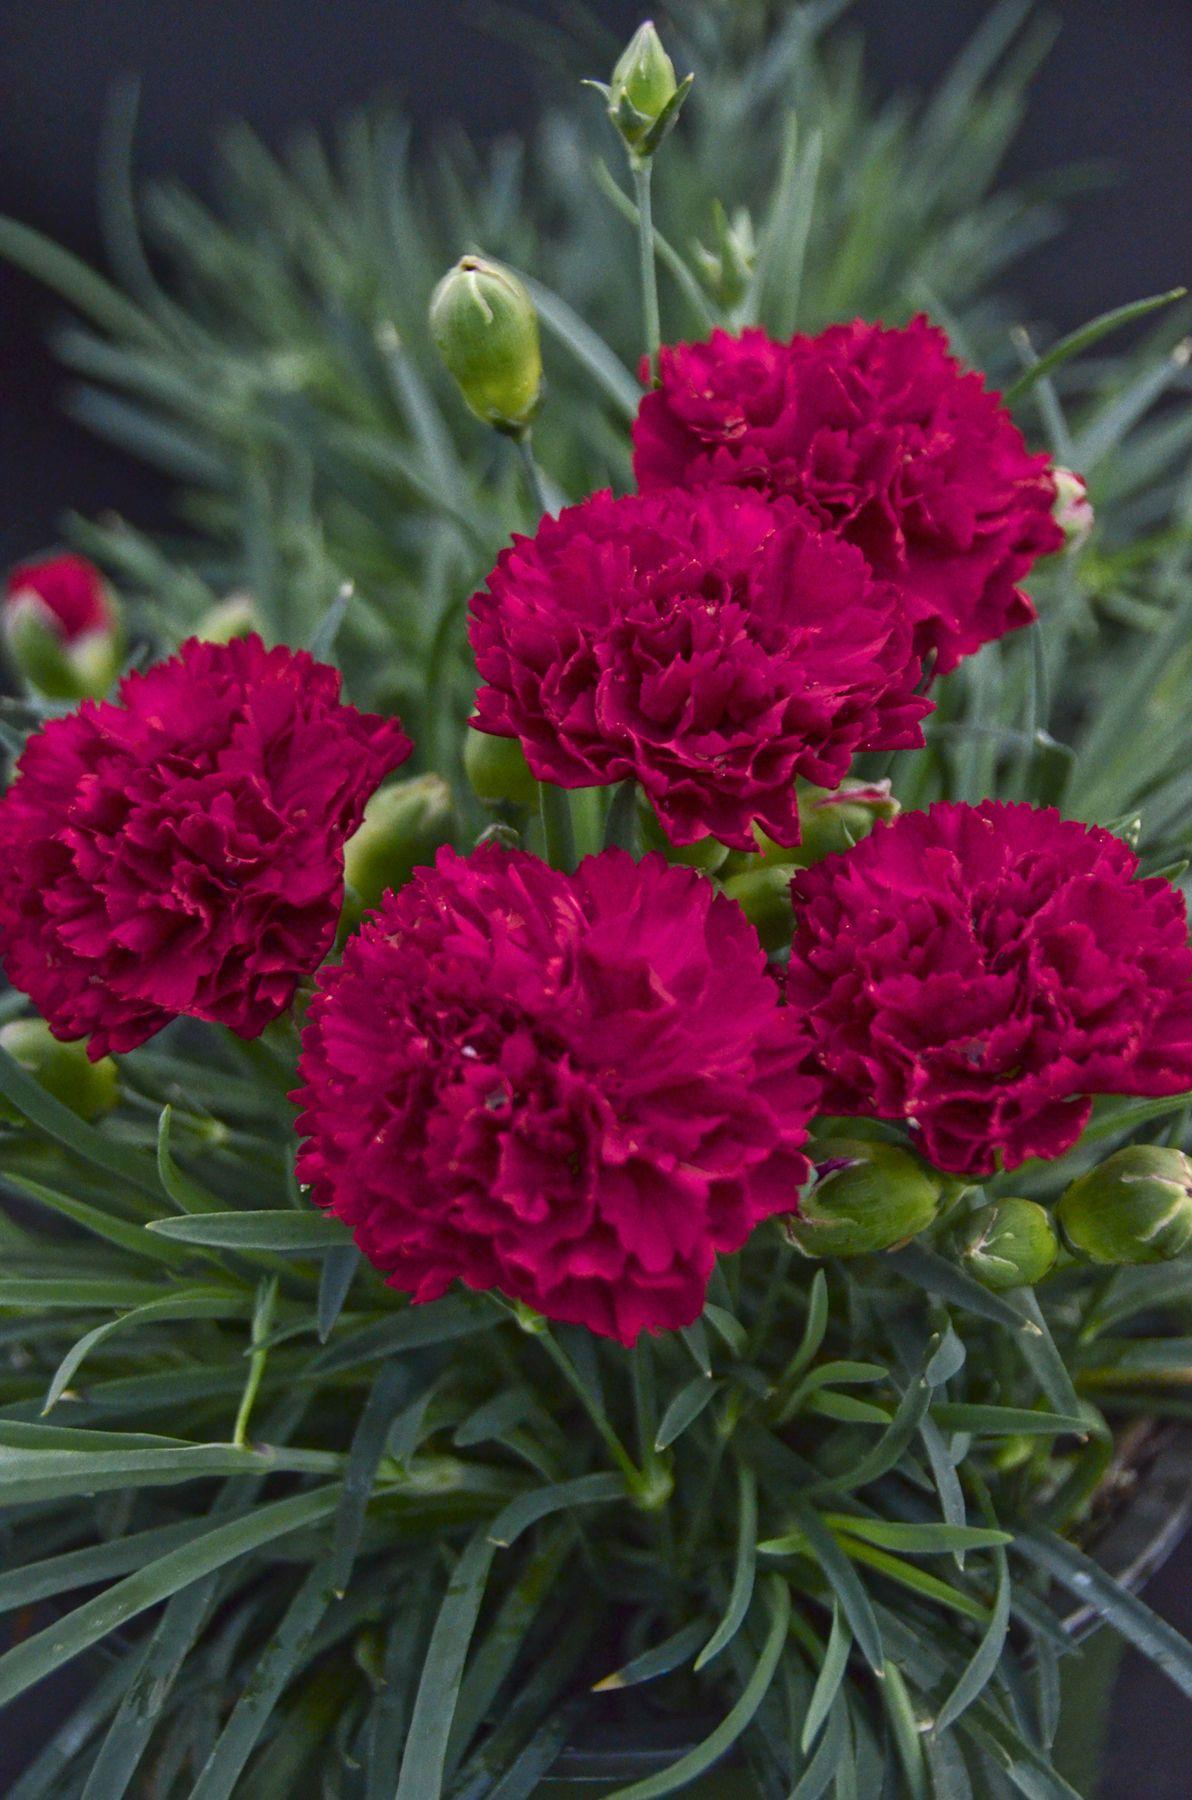 Fruit Punch Cranberry Cocktail Pinks Dianthus Hybrid Carnation Plants Dianthus Flowers Red Plants